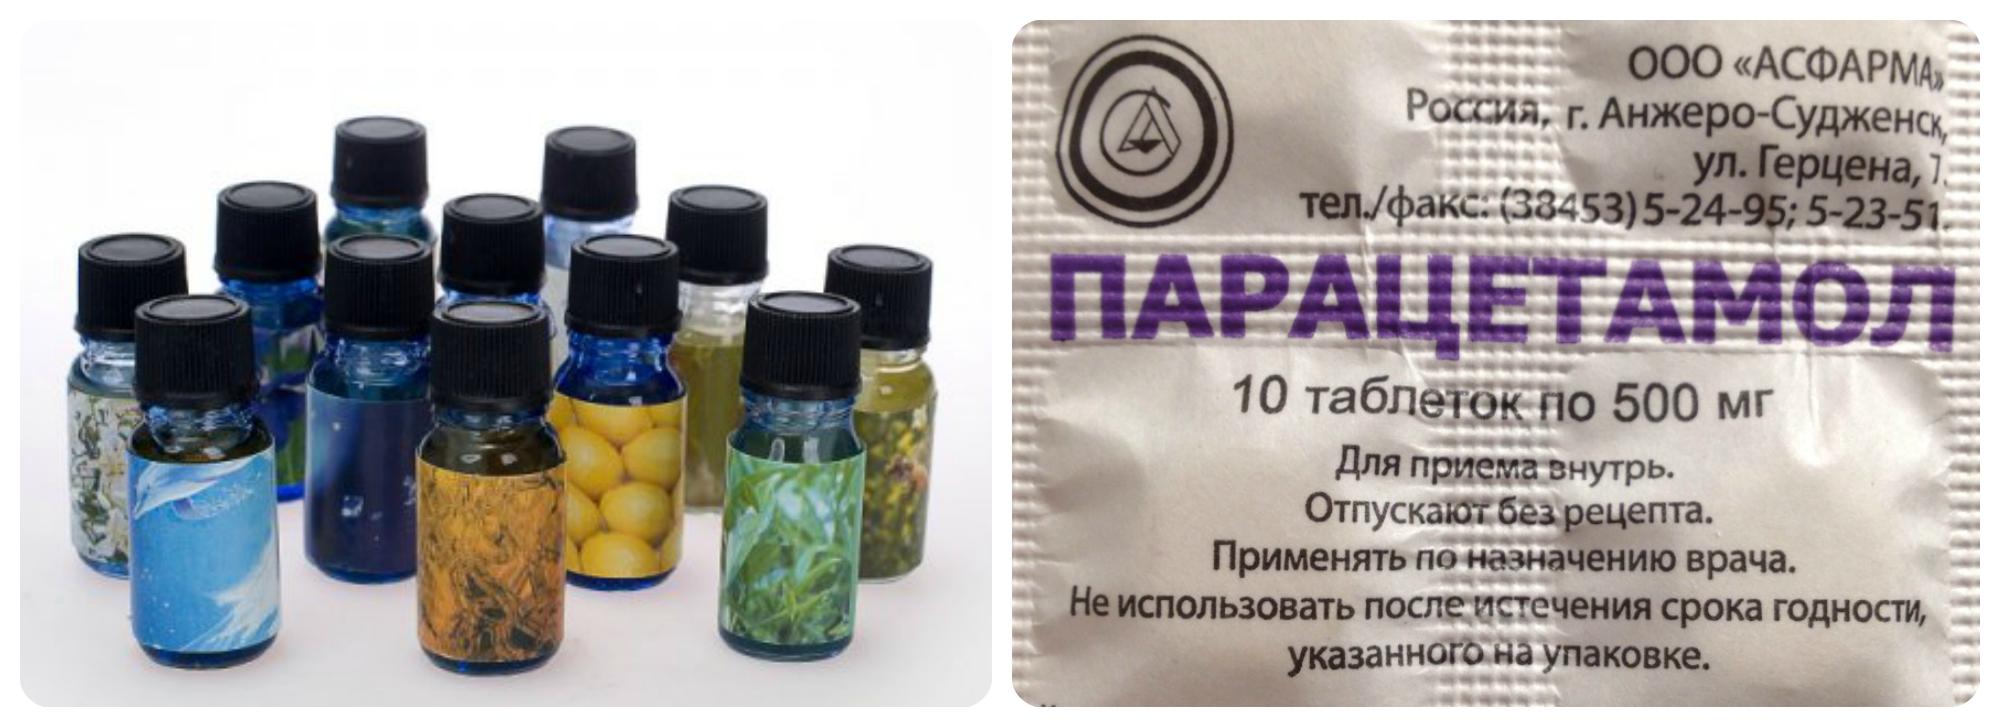 парацетамол и аромомасла